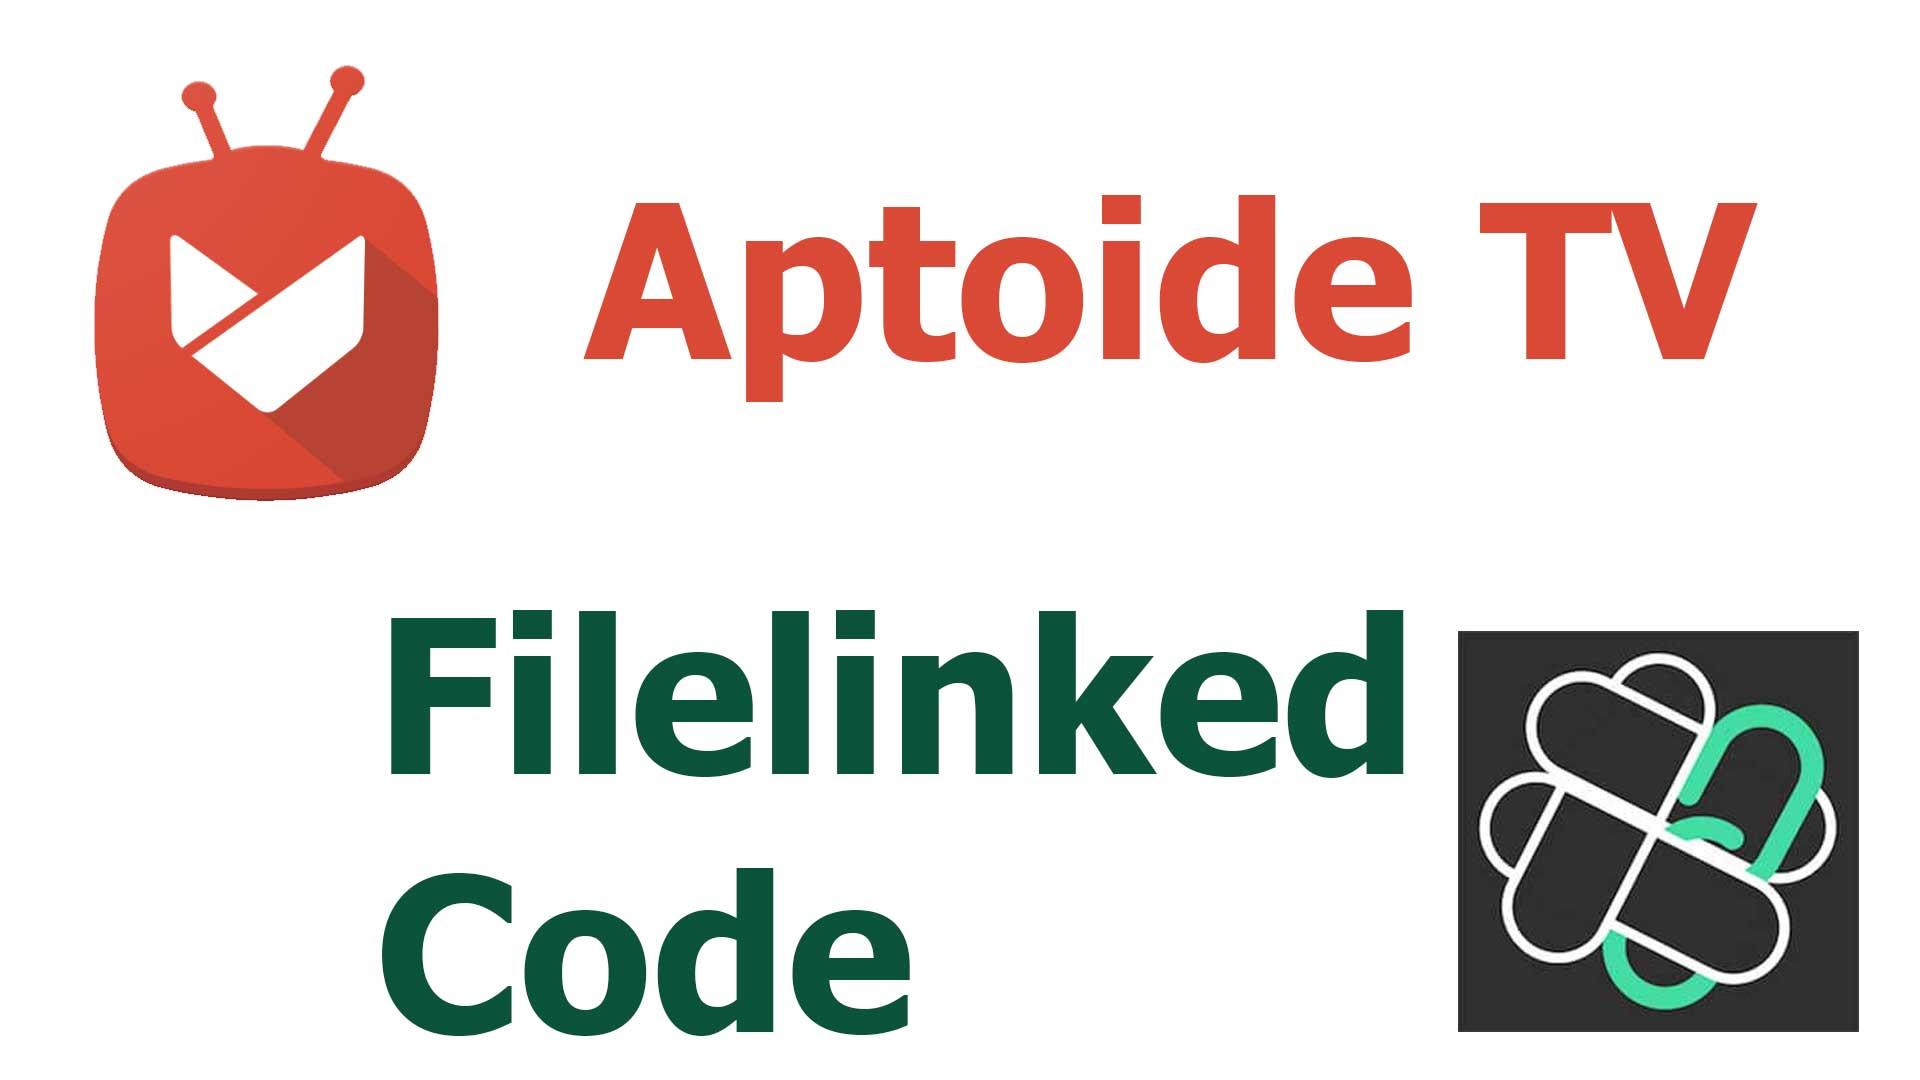 Aptoide TV Filelinked Code